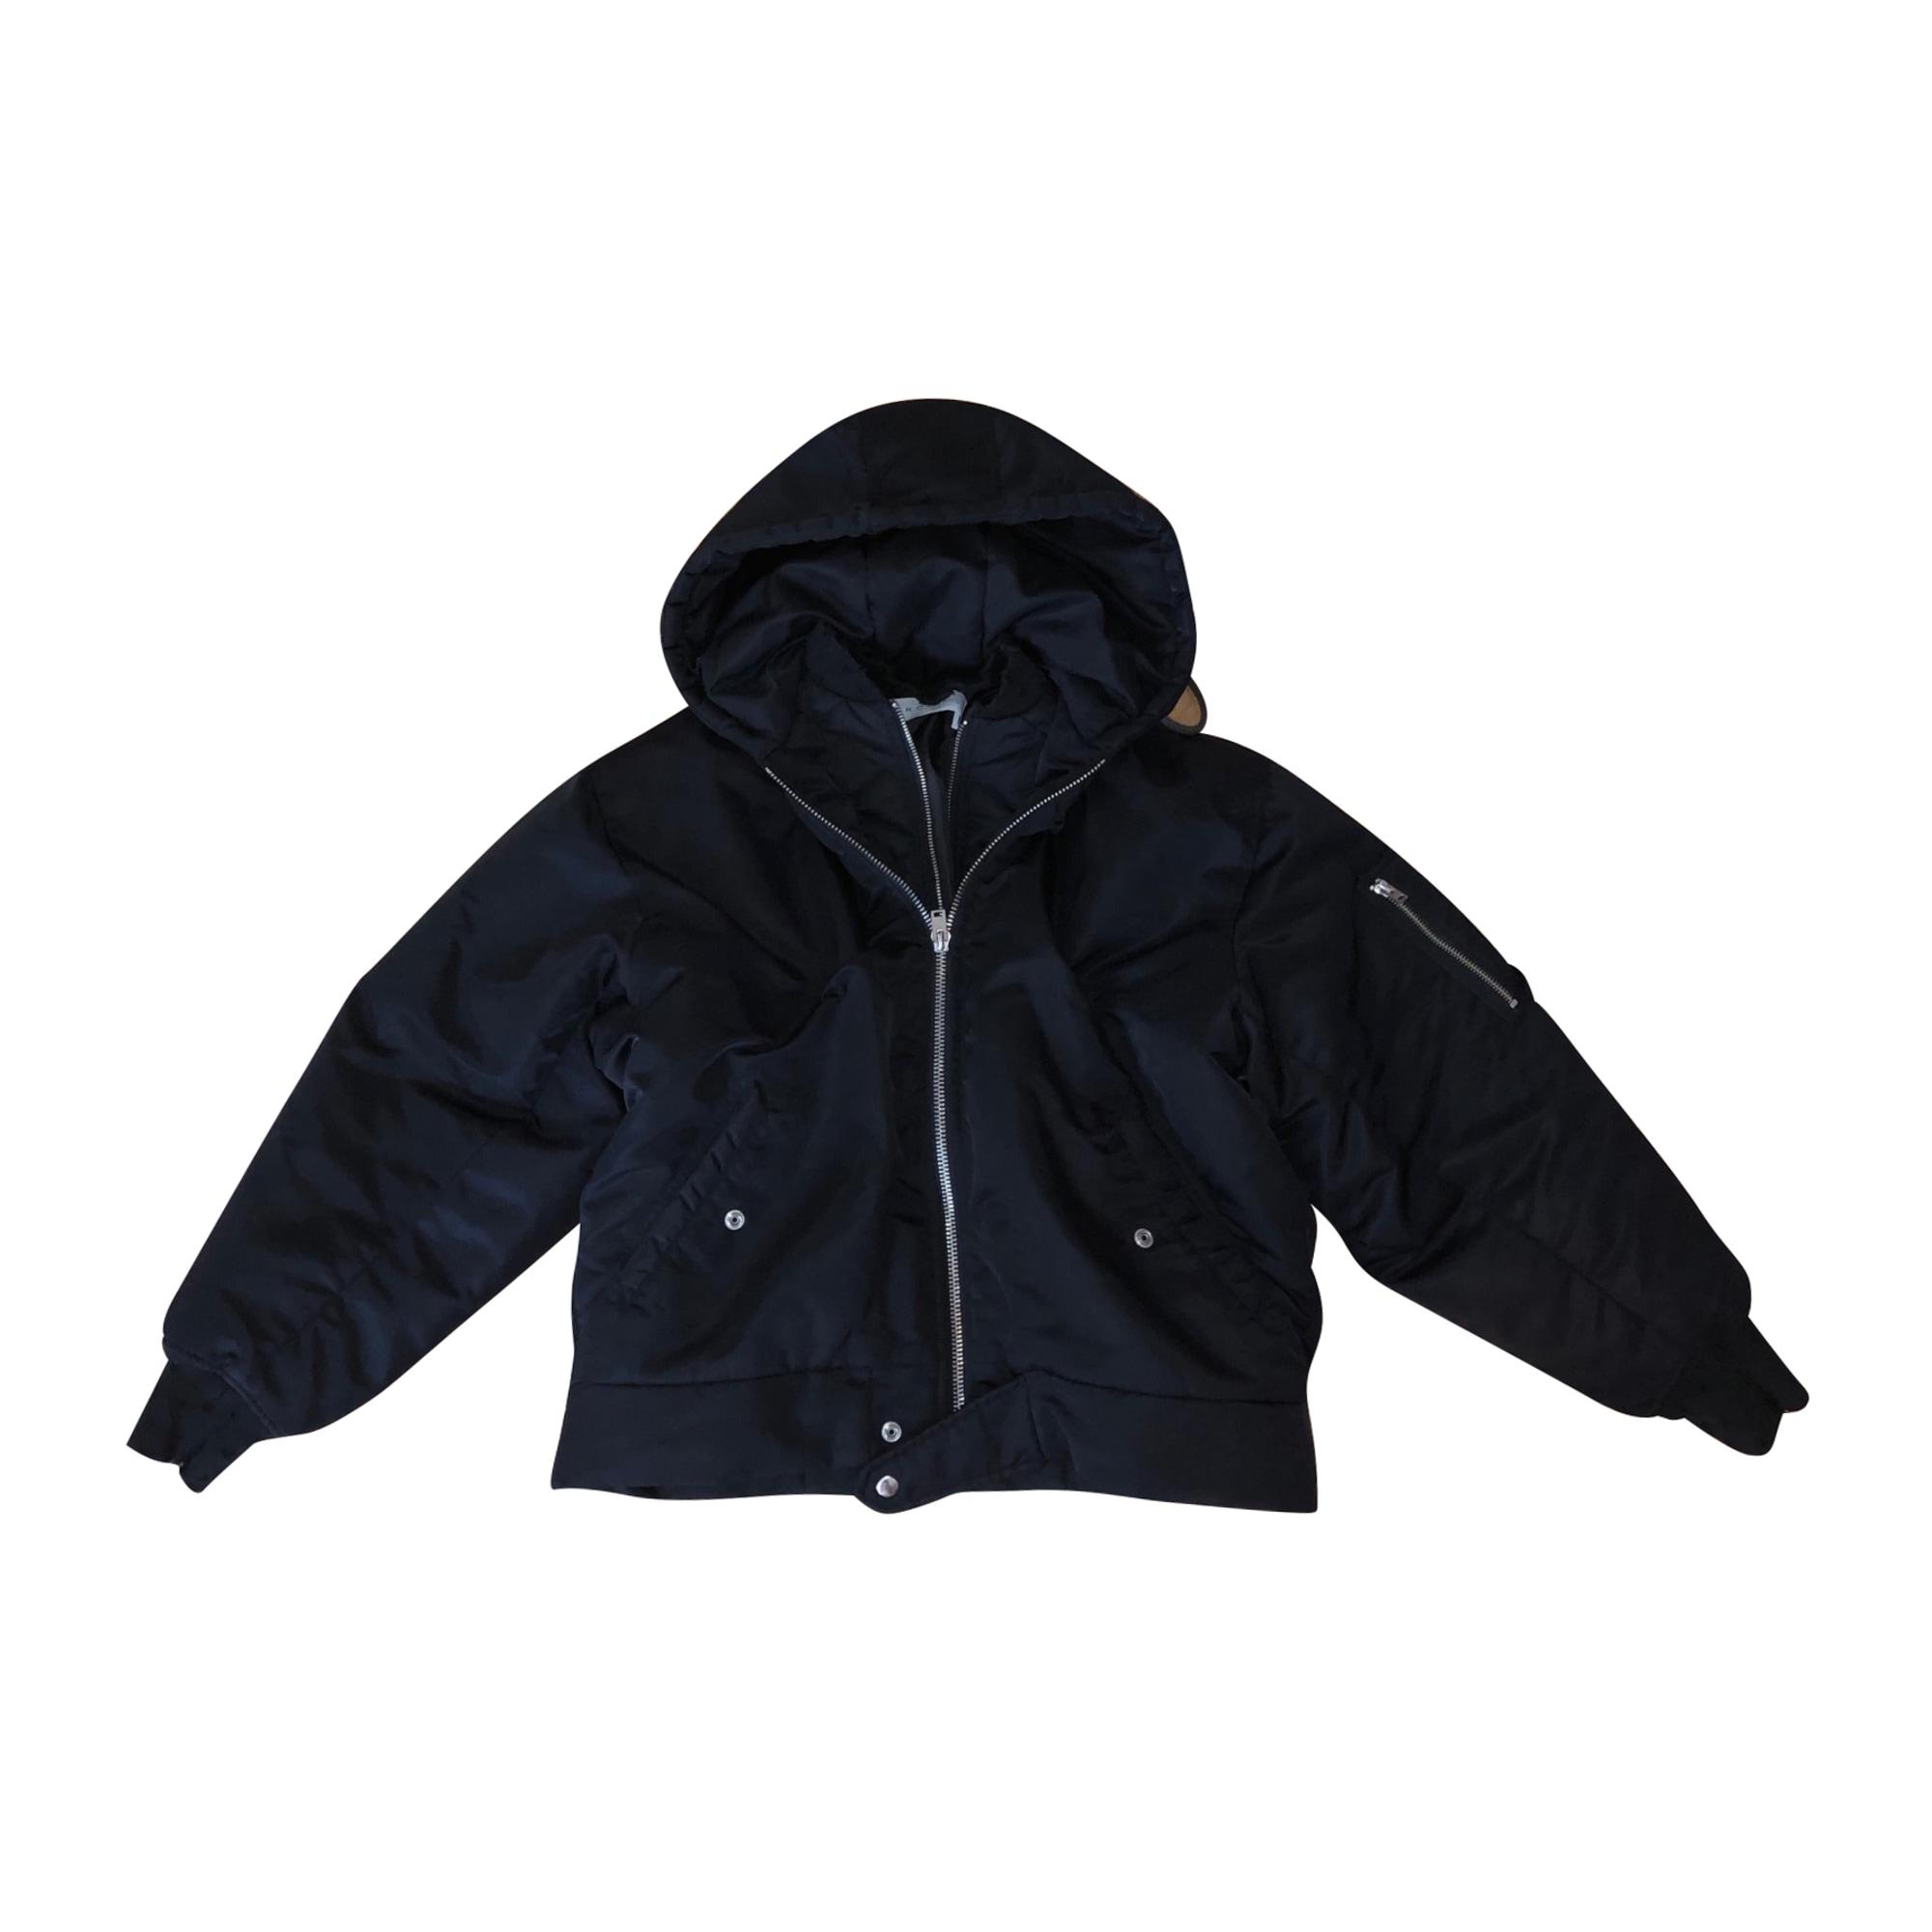 Zipped Jacket IRO Black